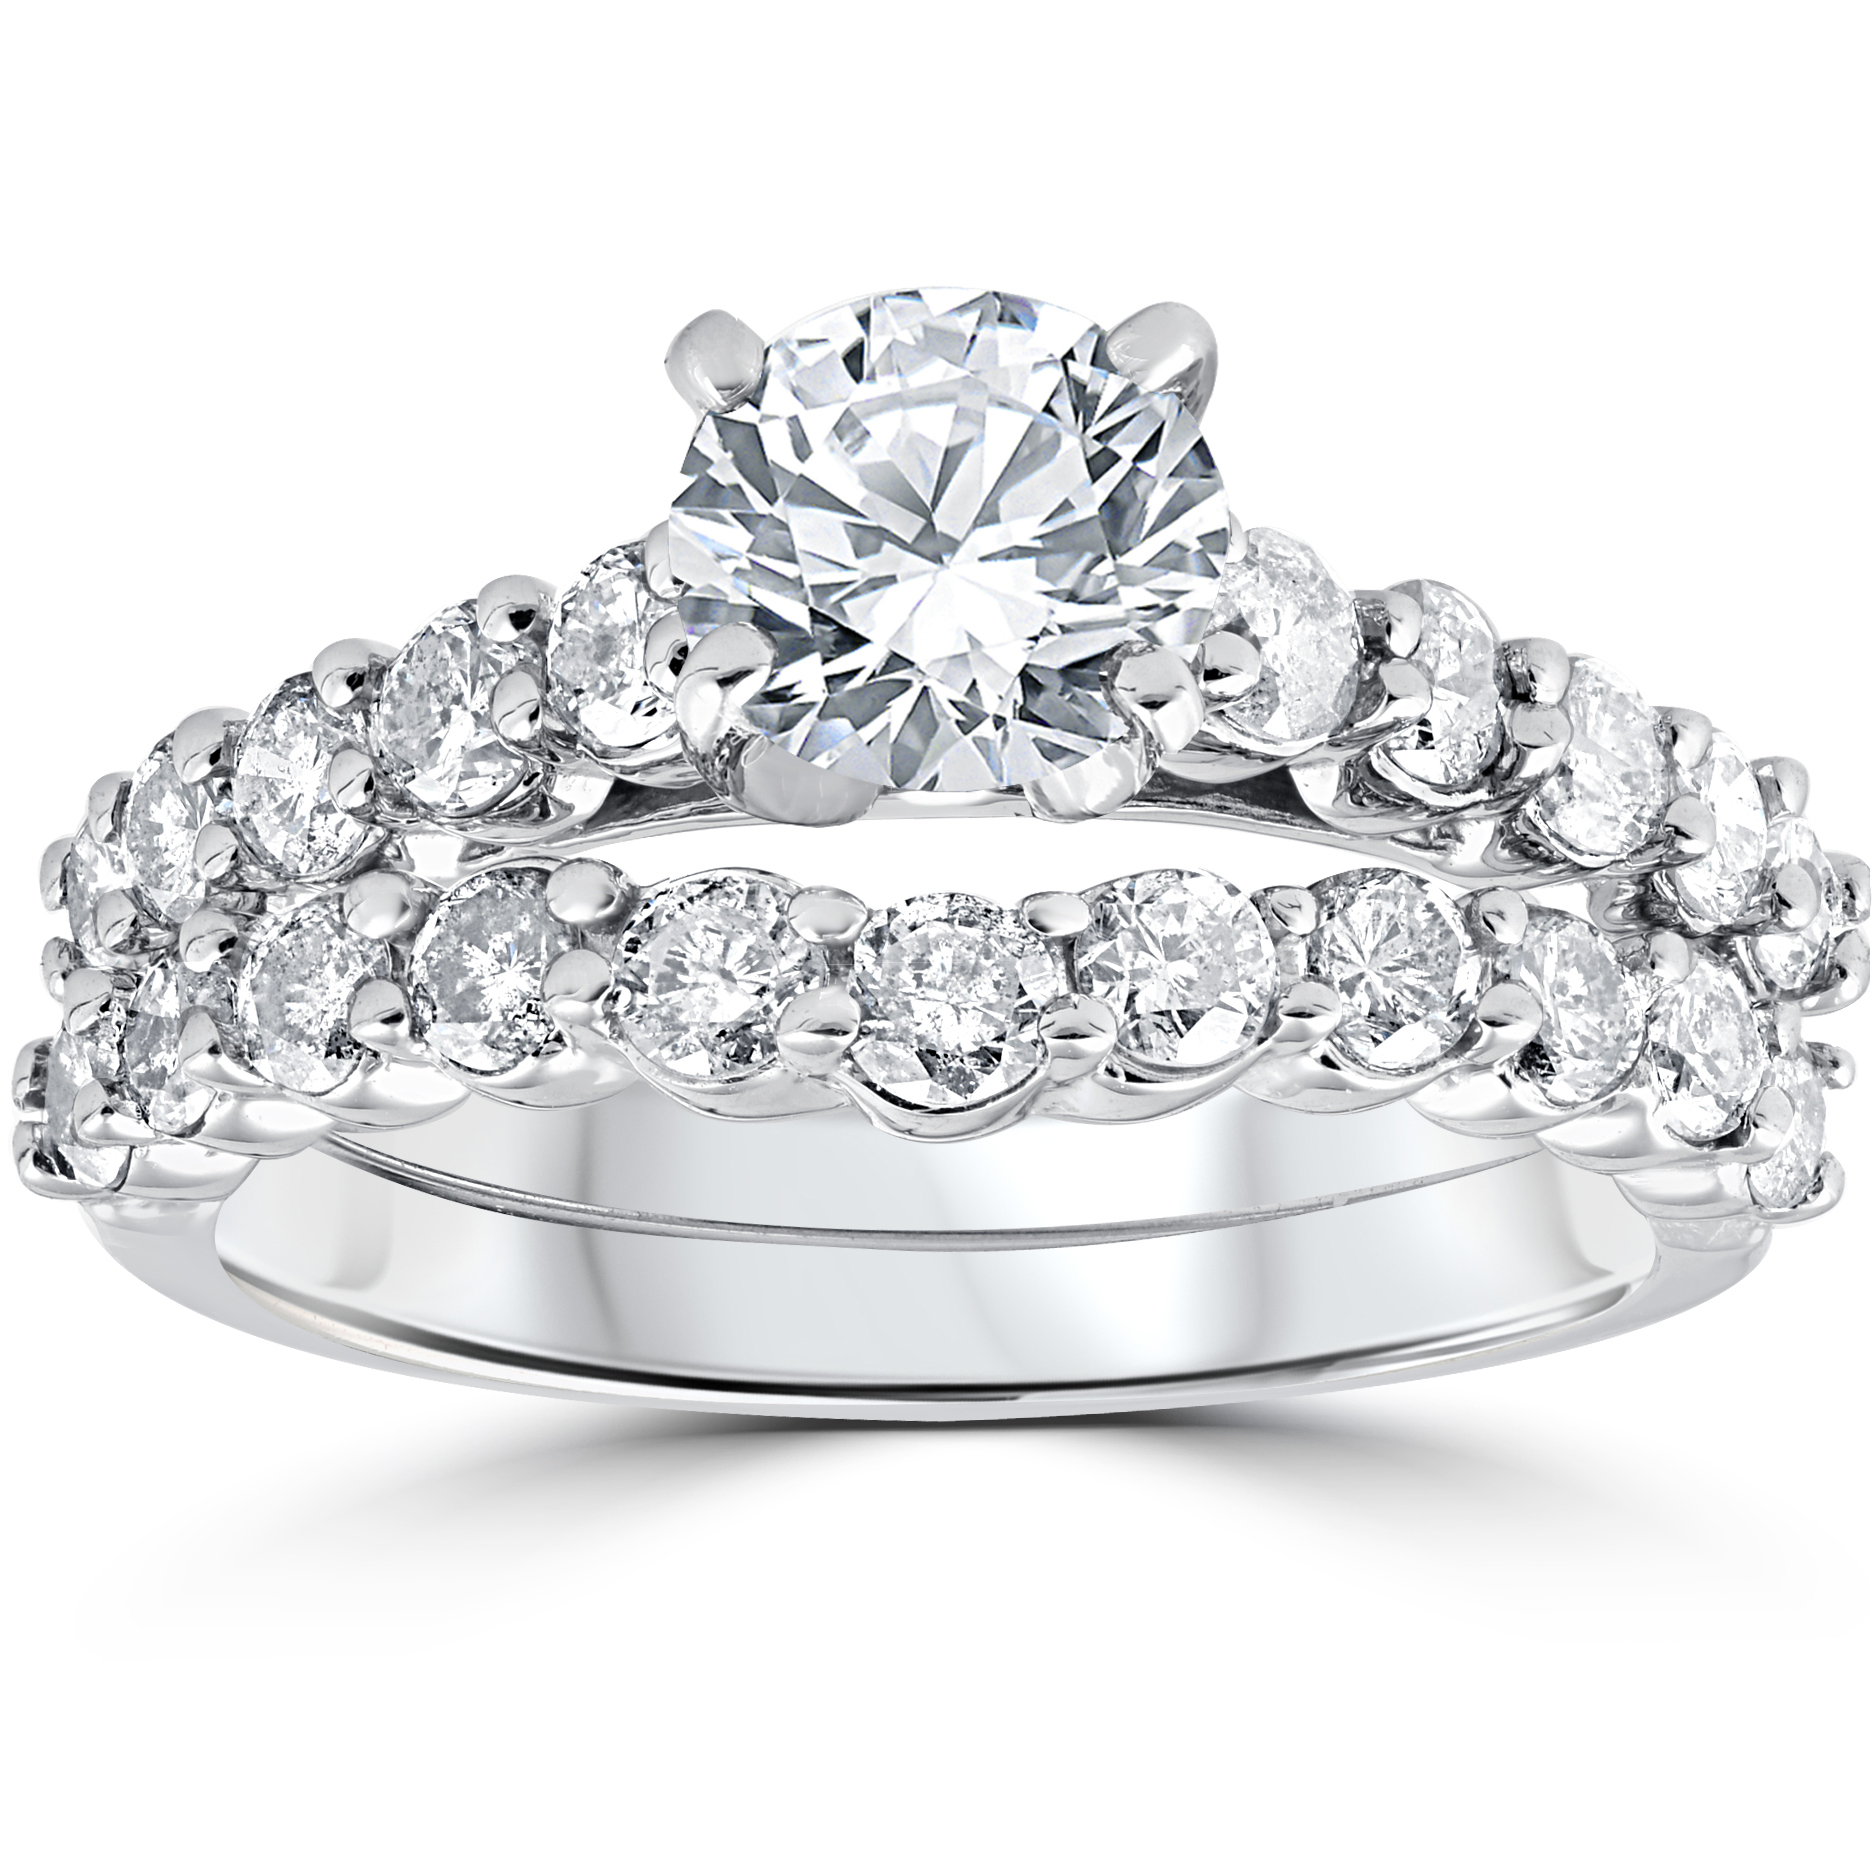 2ct Diamond Engagement Wedding Ring Set 14k White Gold by Pompeii3